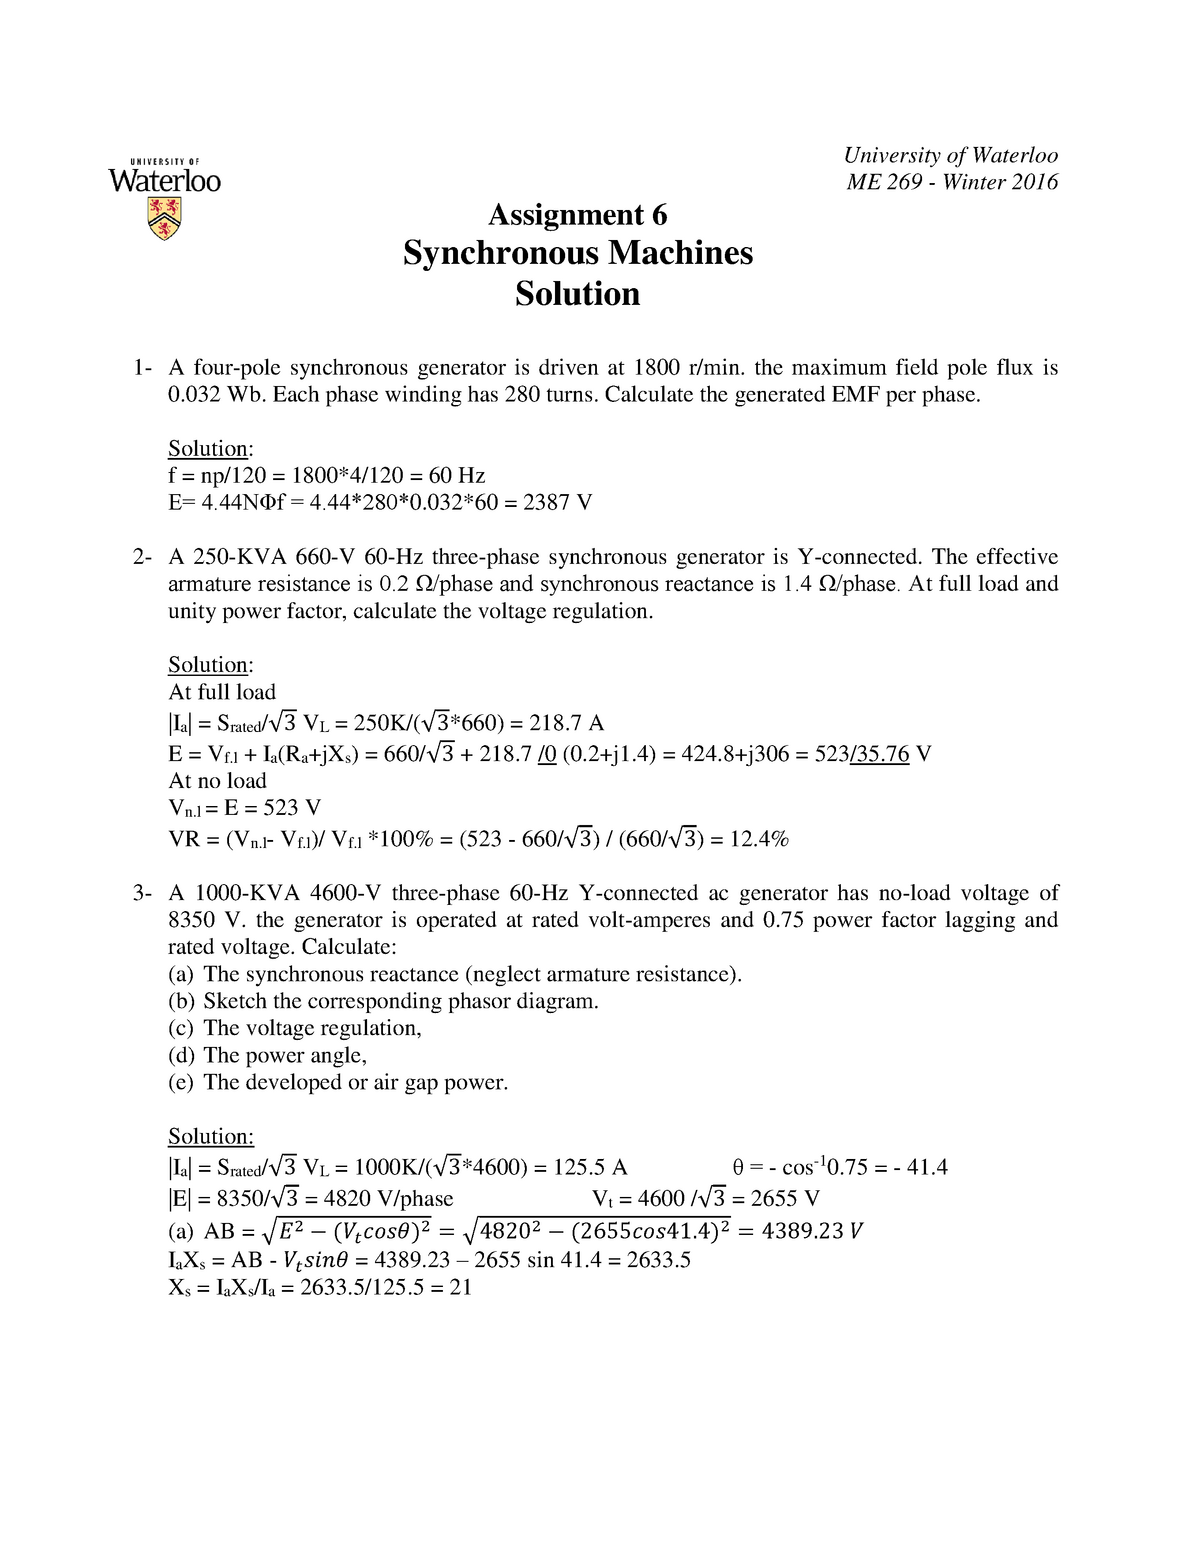 A6 Solution - Study reference - Me 269: Electromech Dev